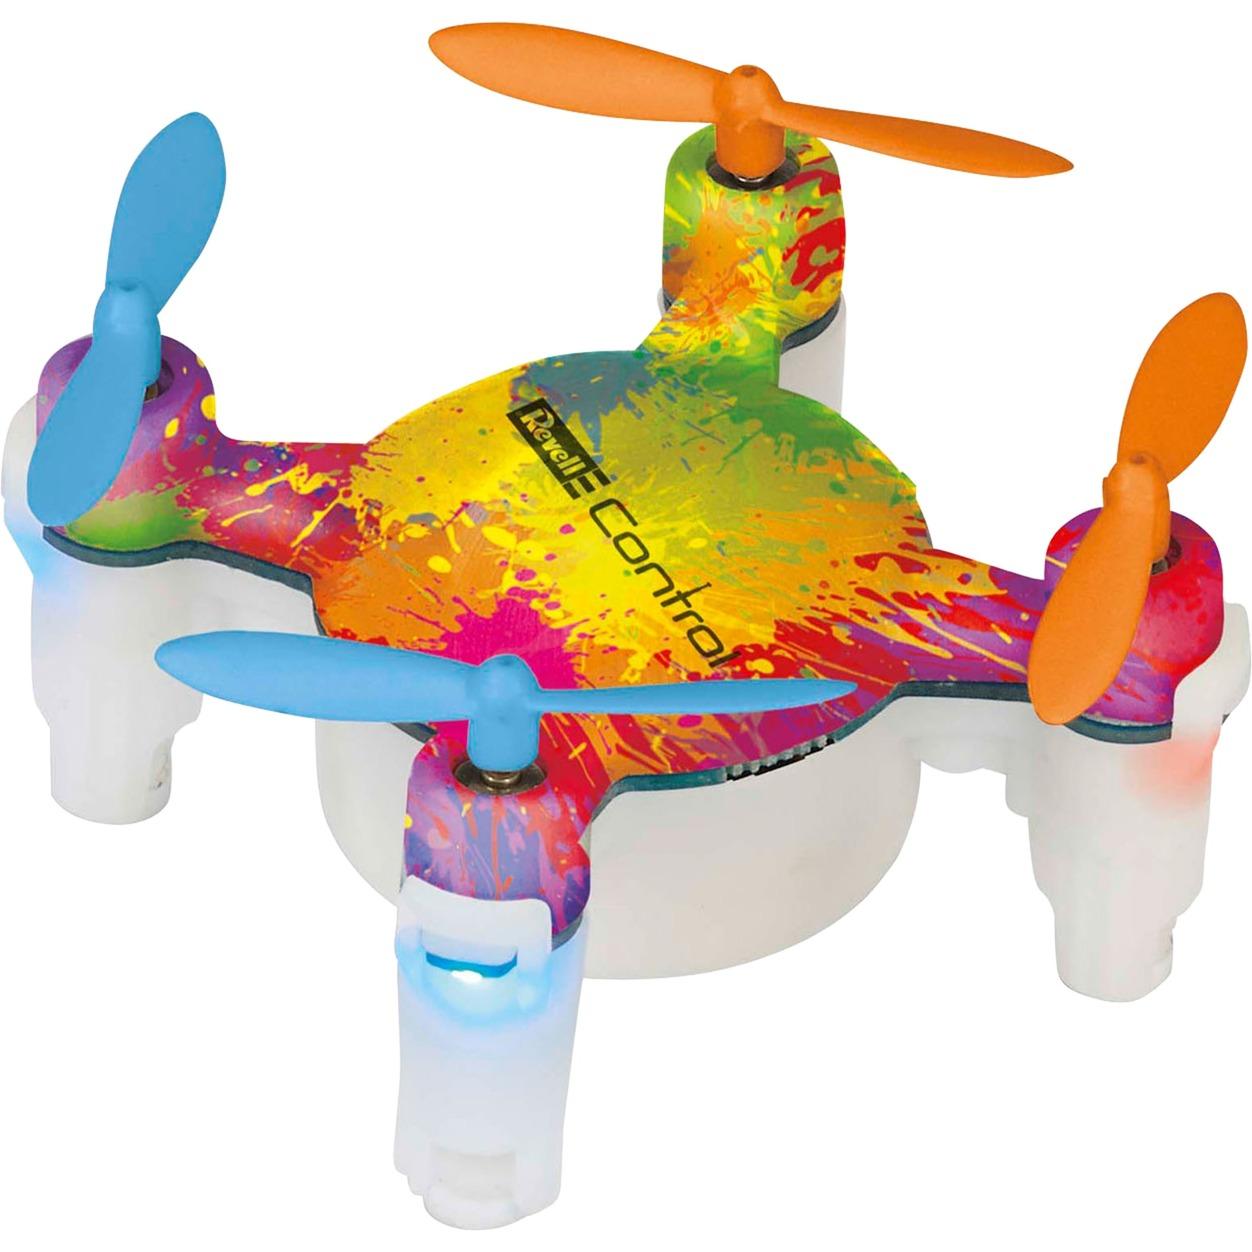 nano-quad-fun-bunt-elektrisk-motor-radio-kontrolleret-rc-helikopter-drone